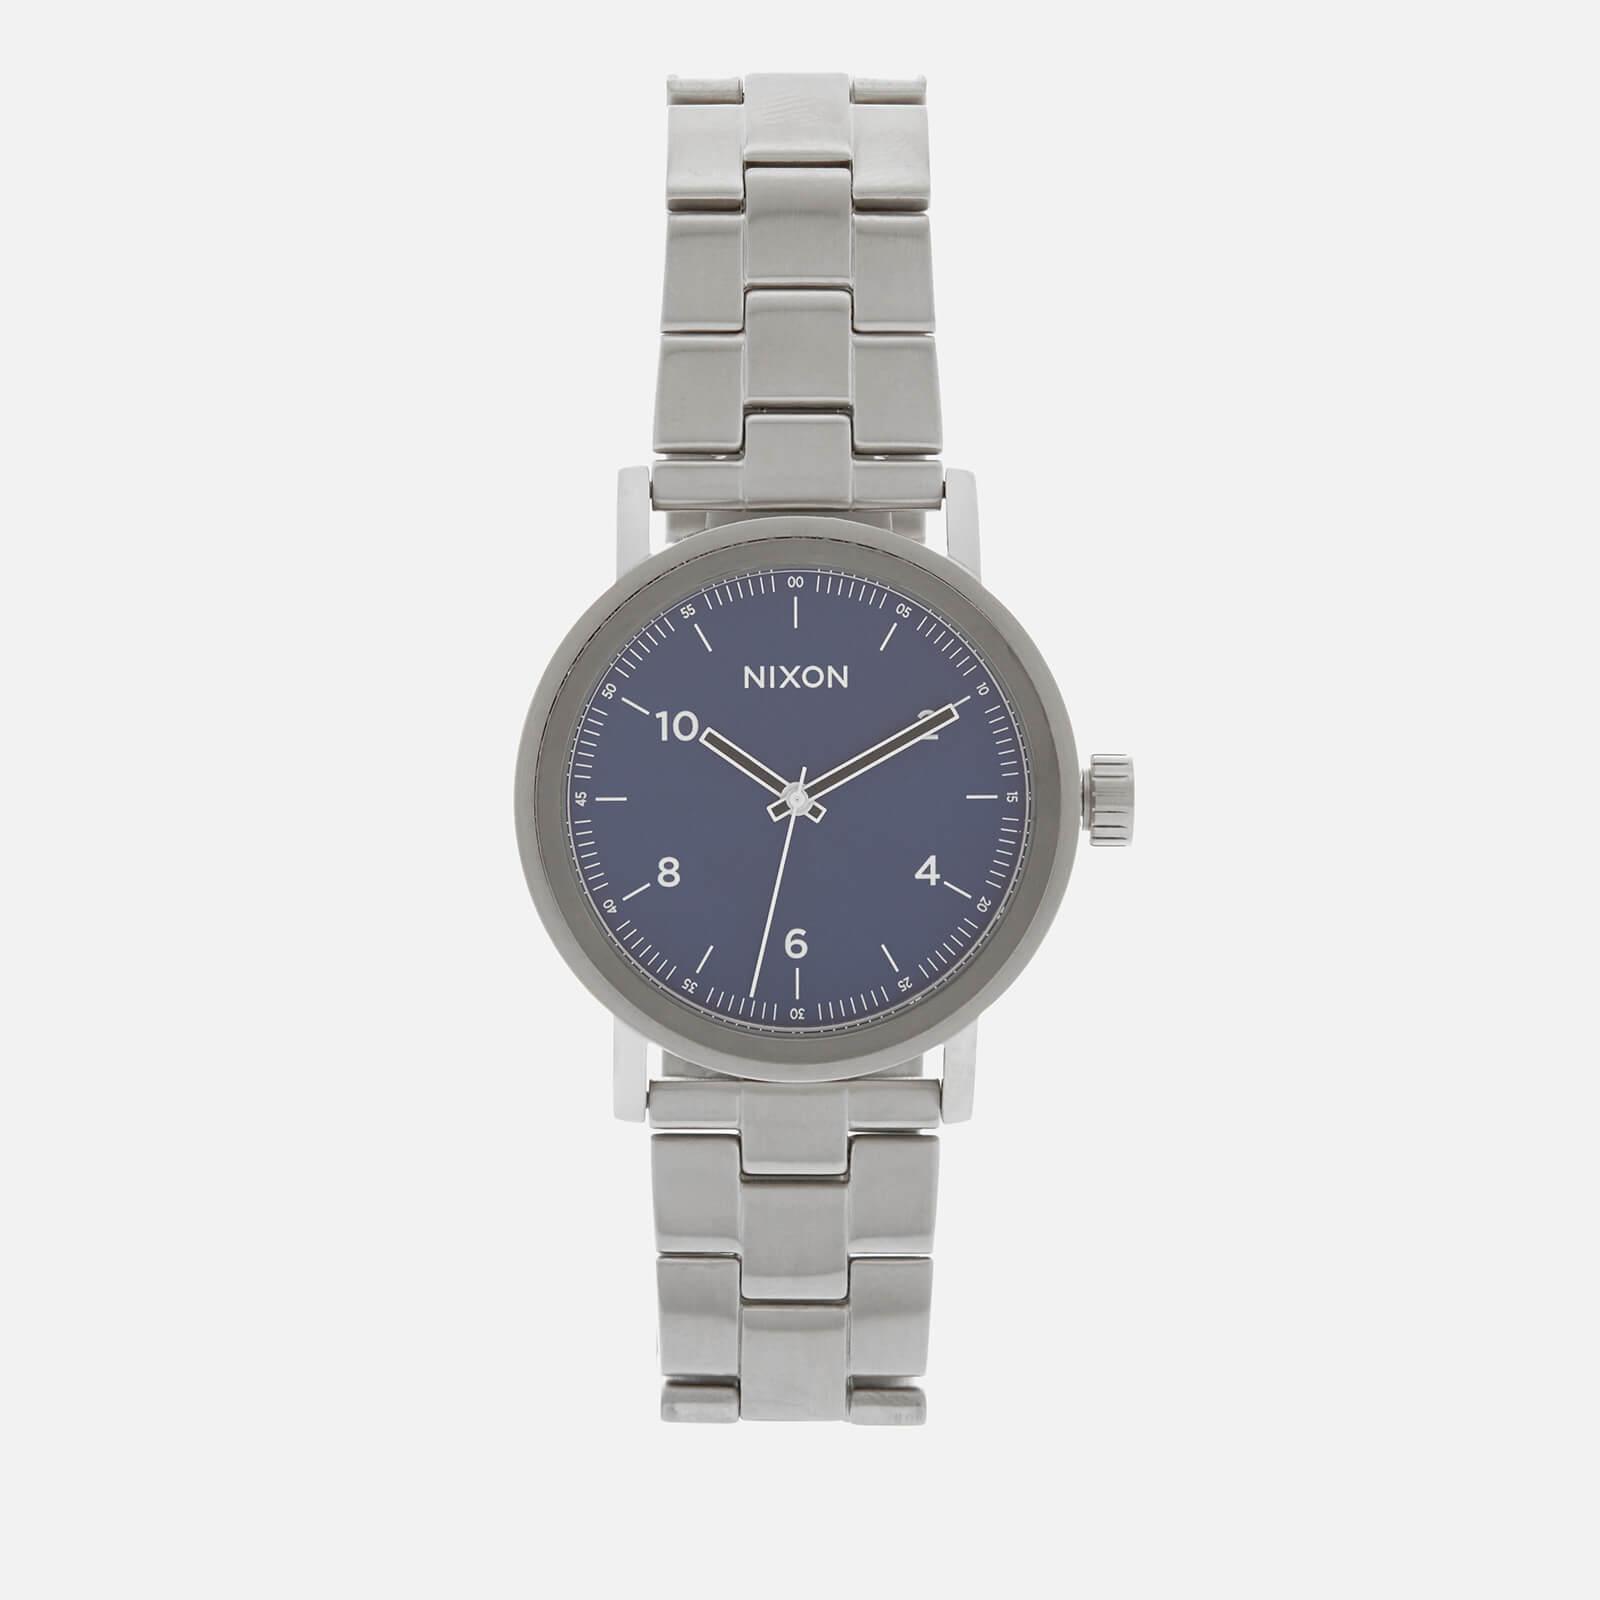 Nixon Men's The Stark Watch - Blue Sunray